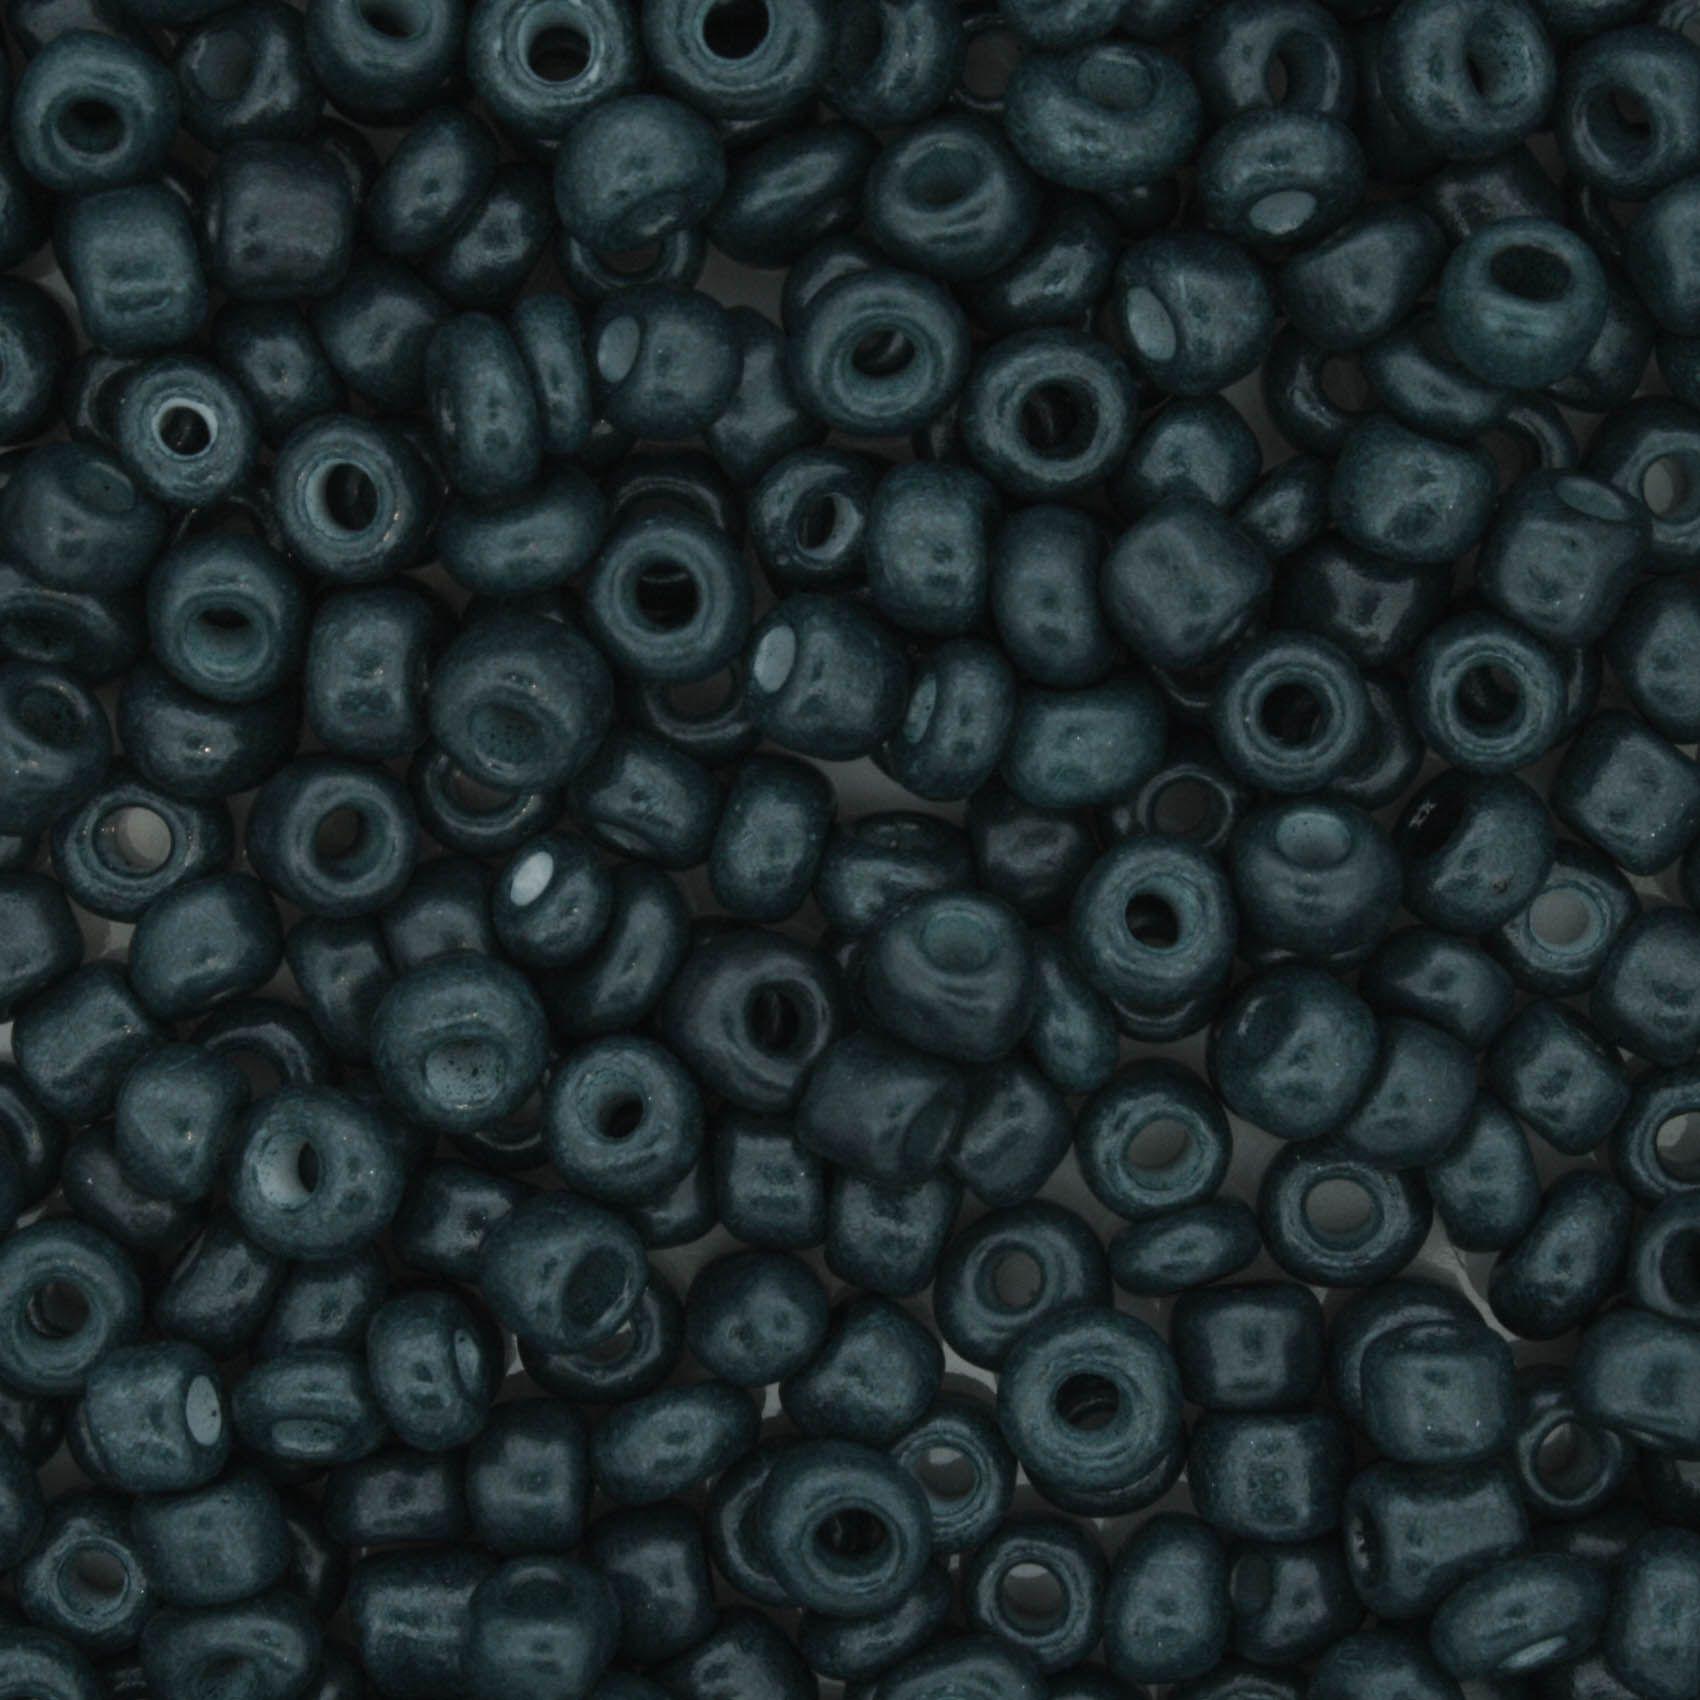 Miçanga - Verde Escuro 6/0 [4x3mm]  - Stéphanie Bijoux® - Peças para Bijuterias e Artesanato